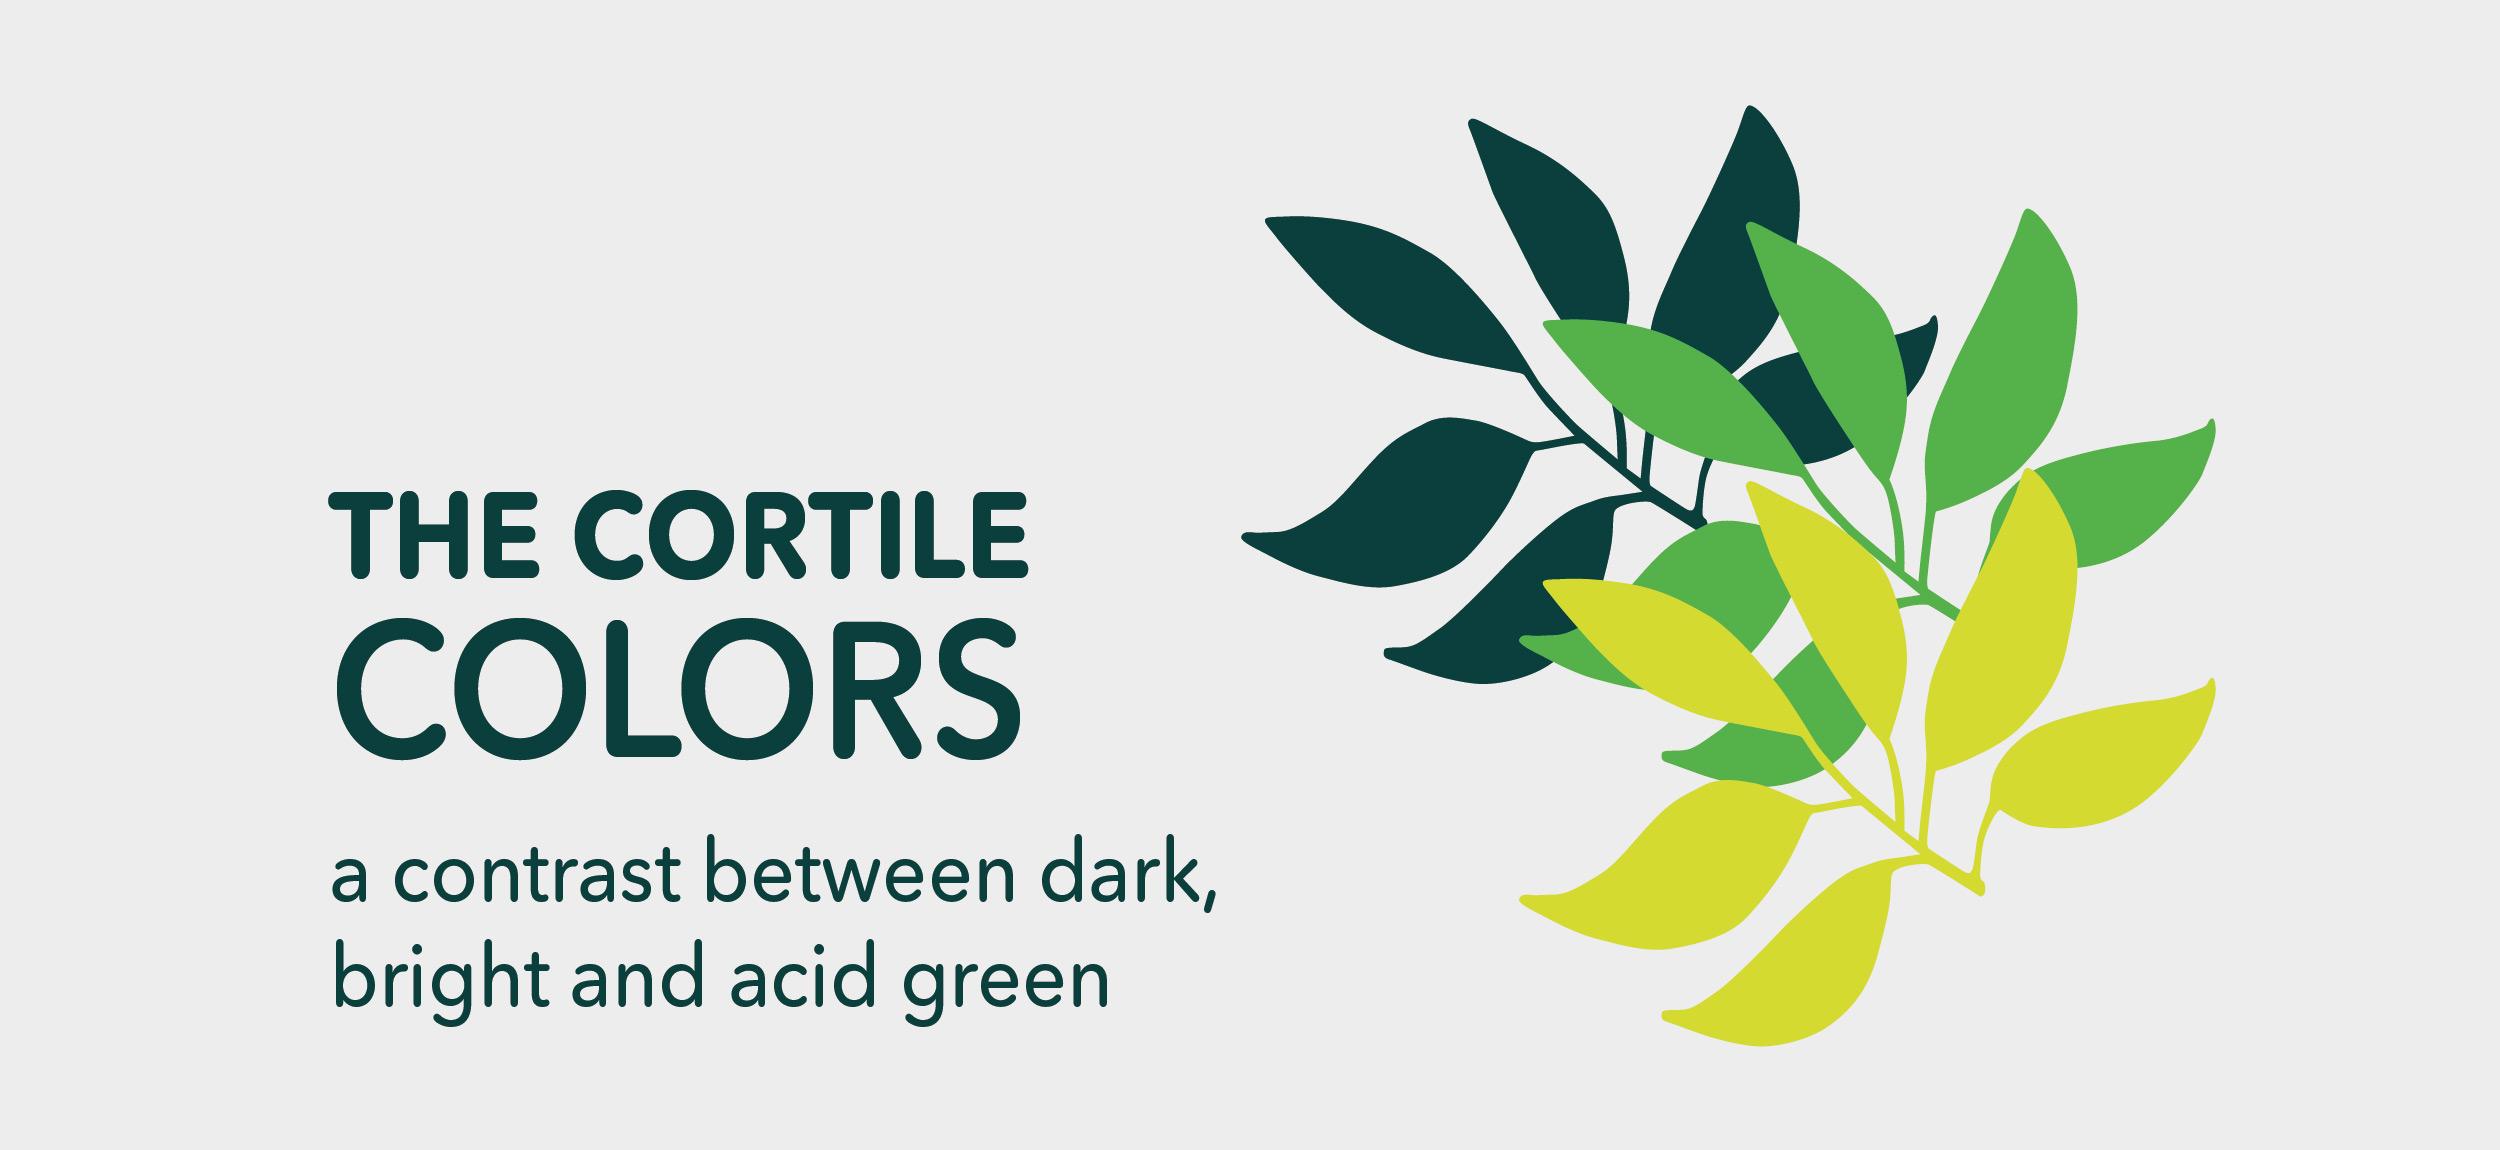 Cortile colors by GPU Design